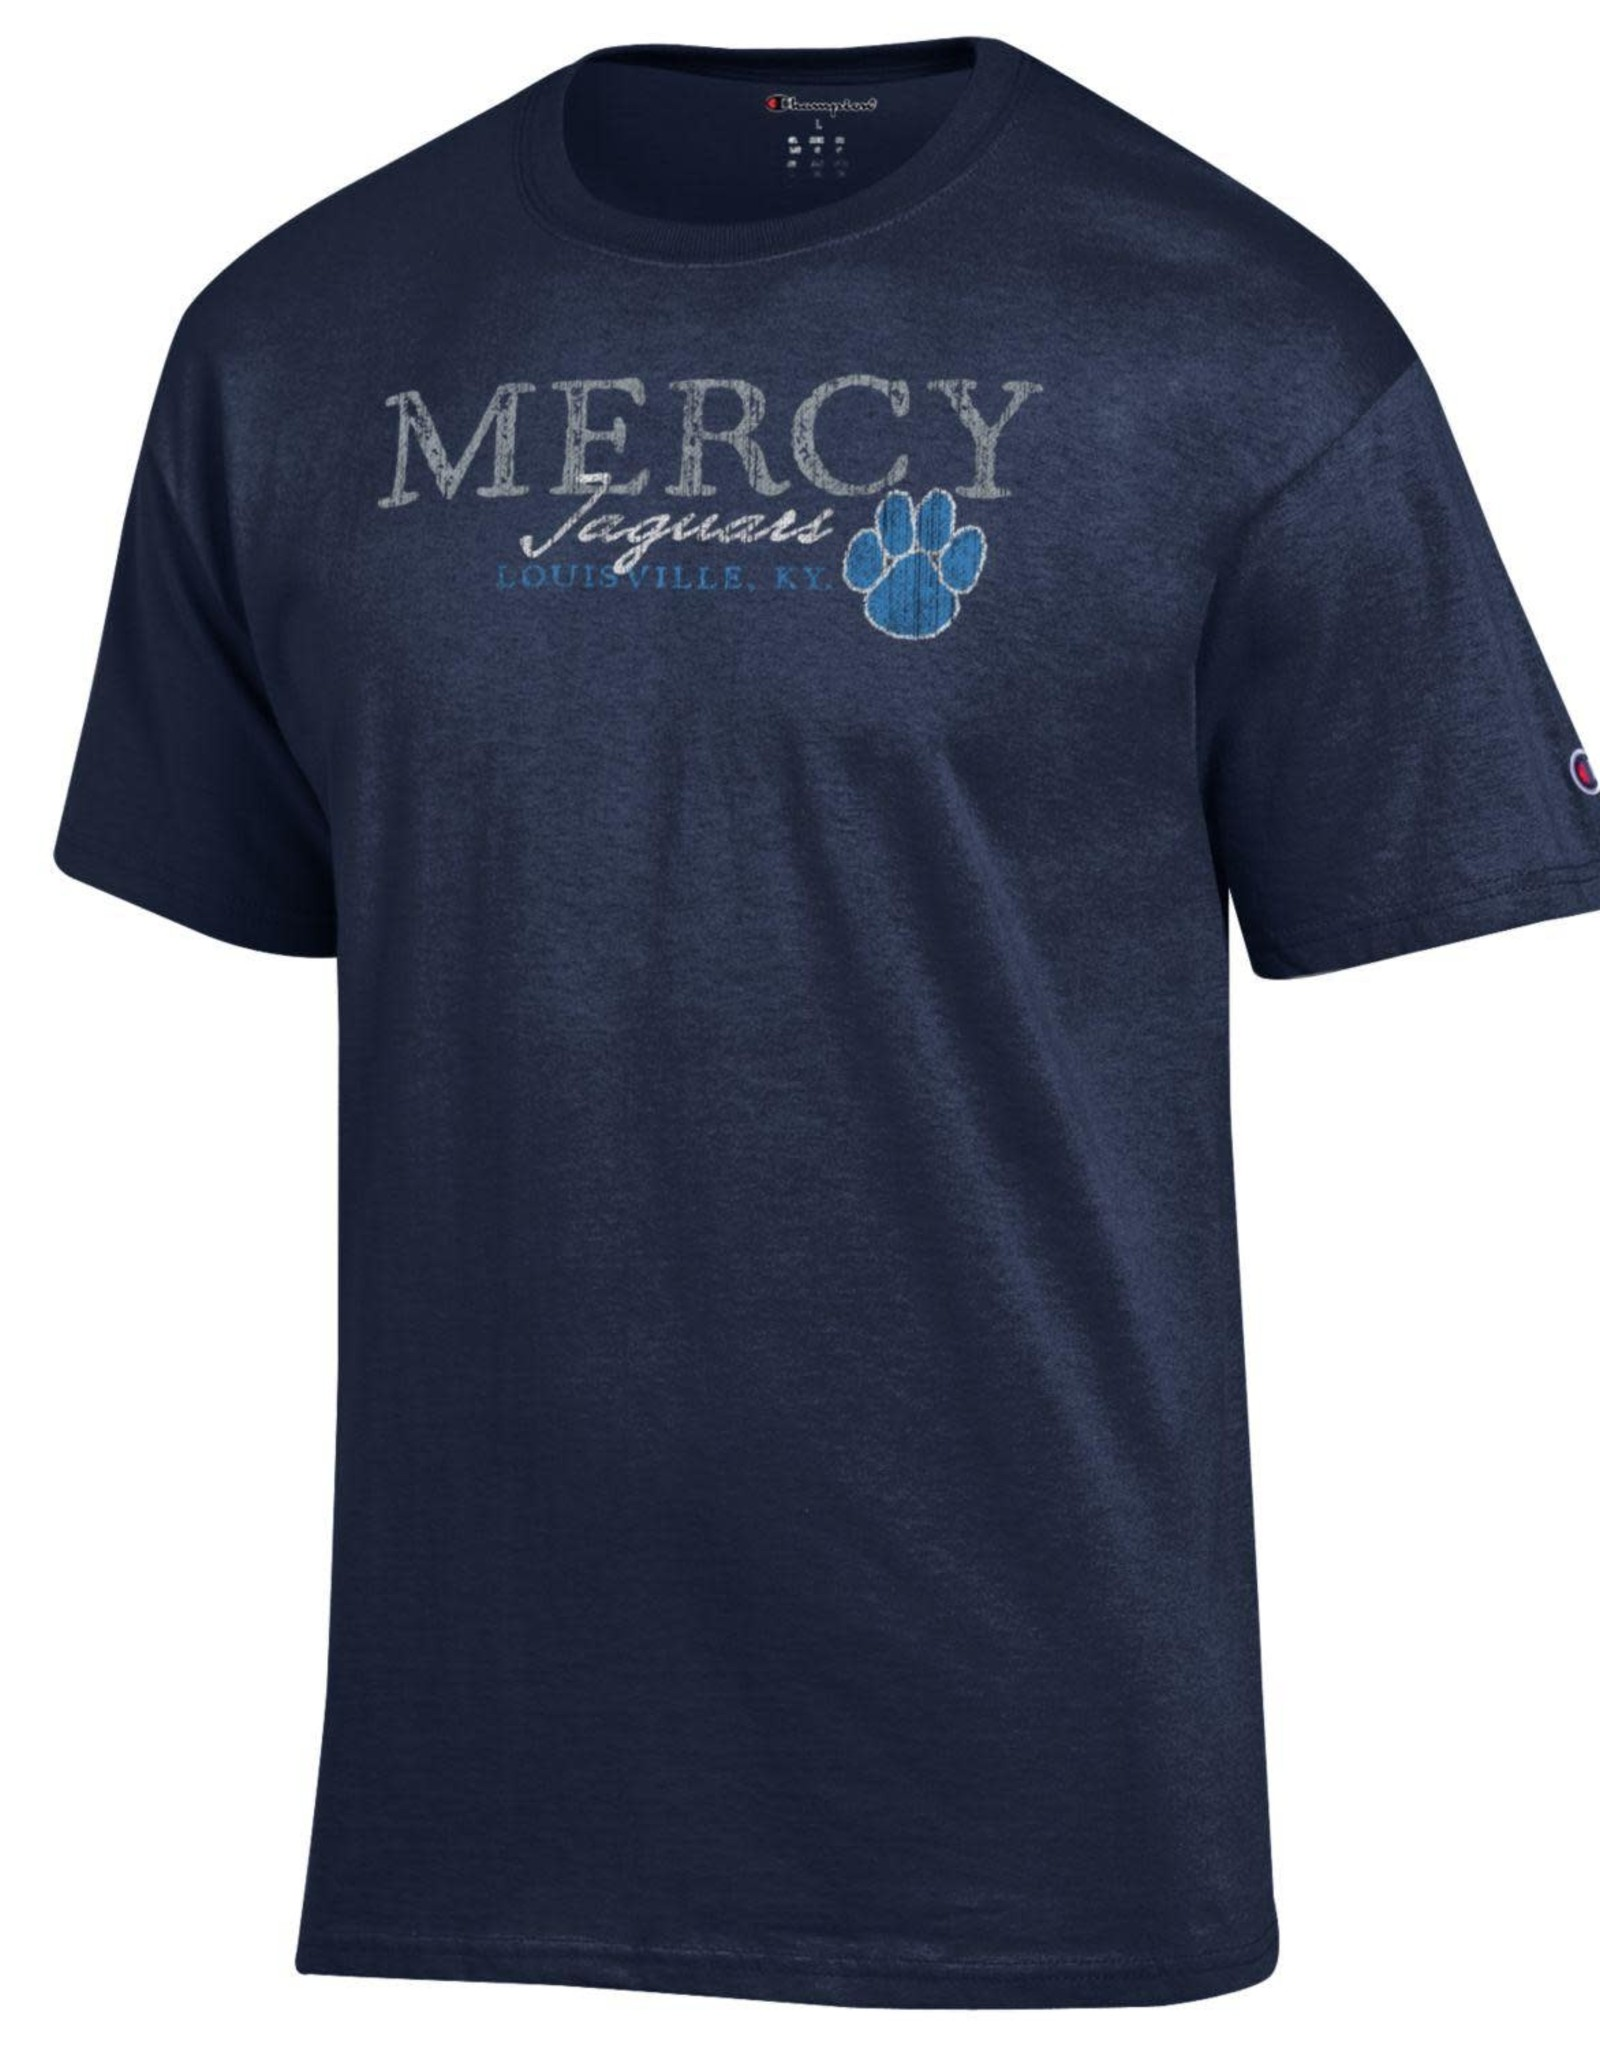 CHAMPION Mercy Jaguars Louisville KY Paw Print T-Shirt